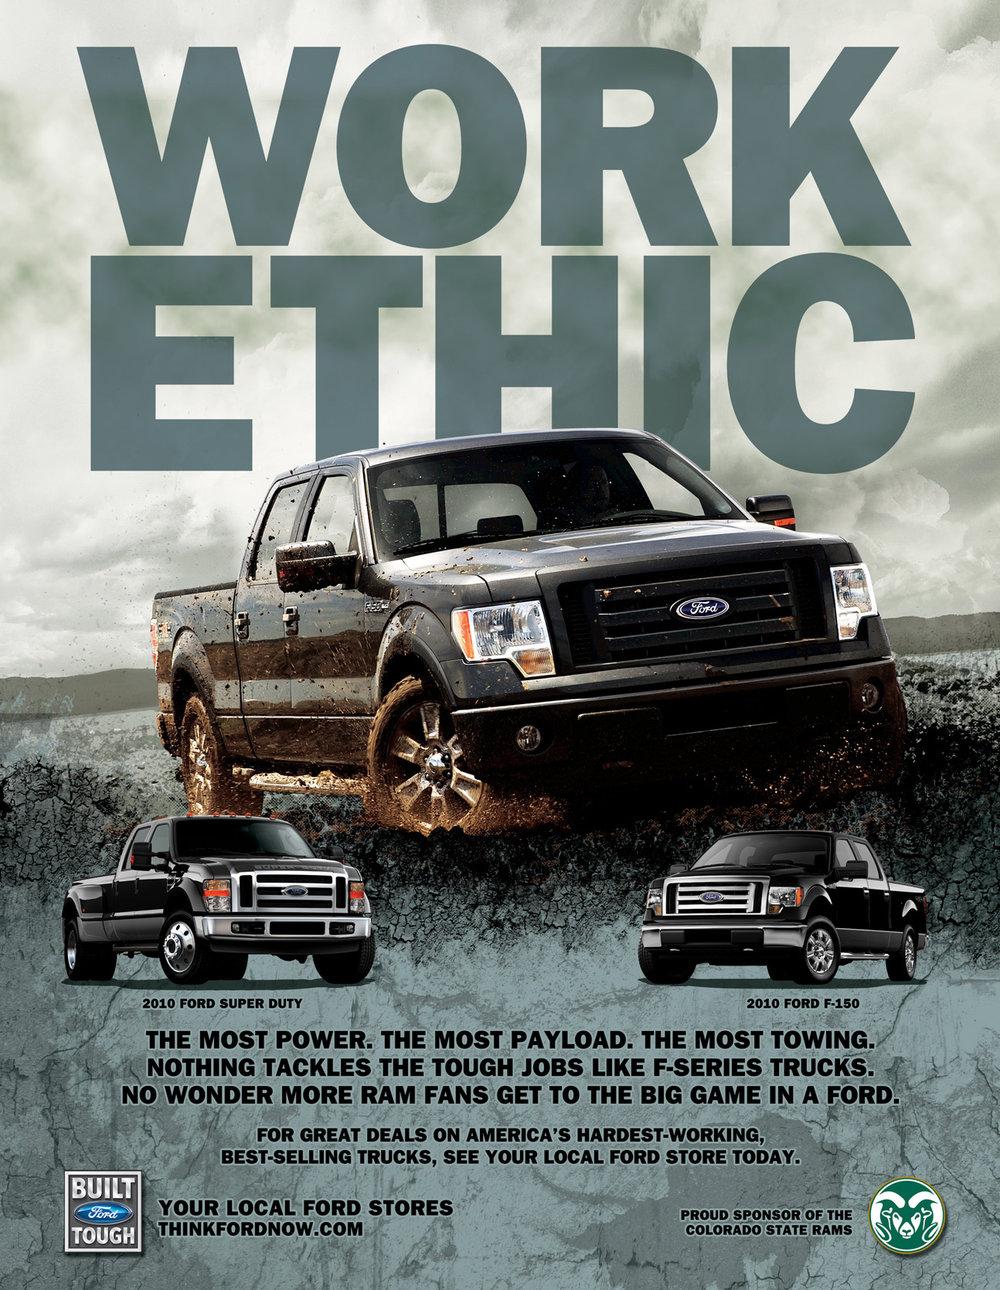 Ford-WorkEthic.jpg